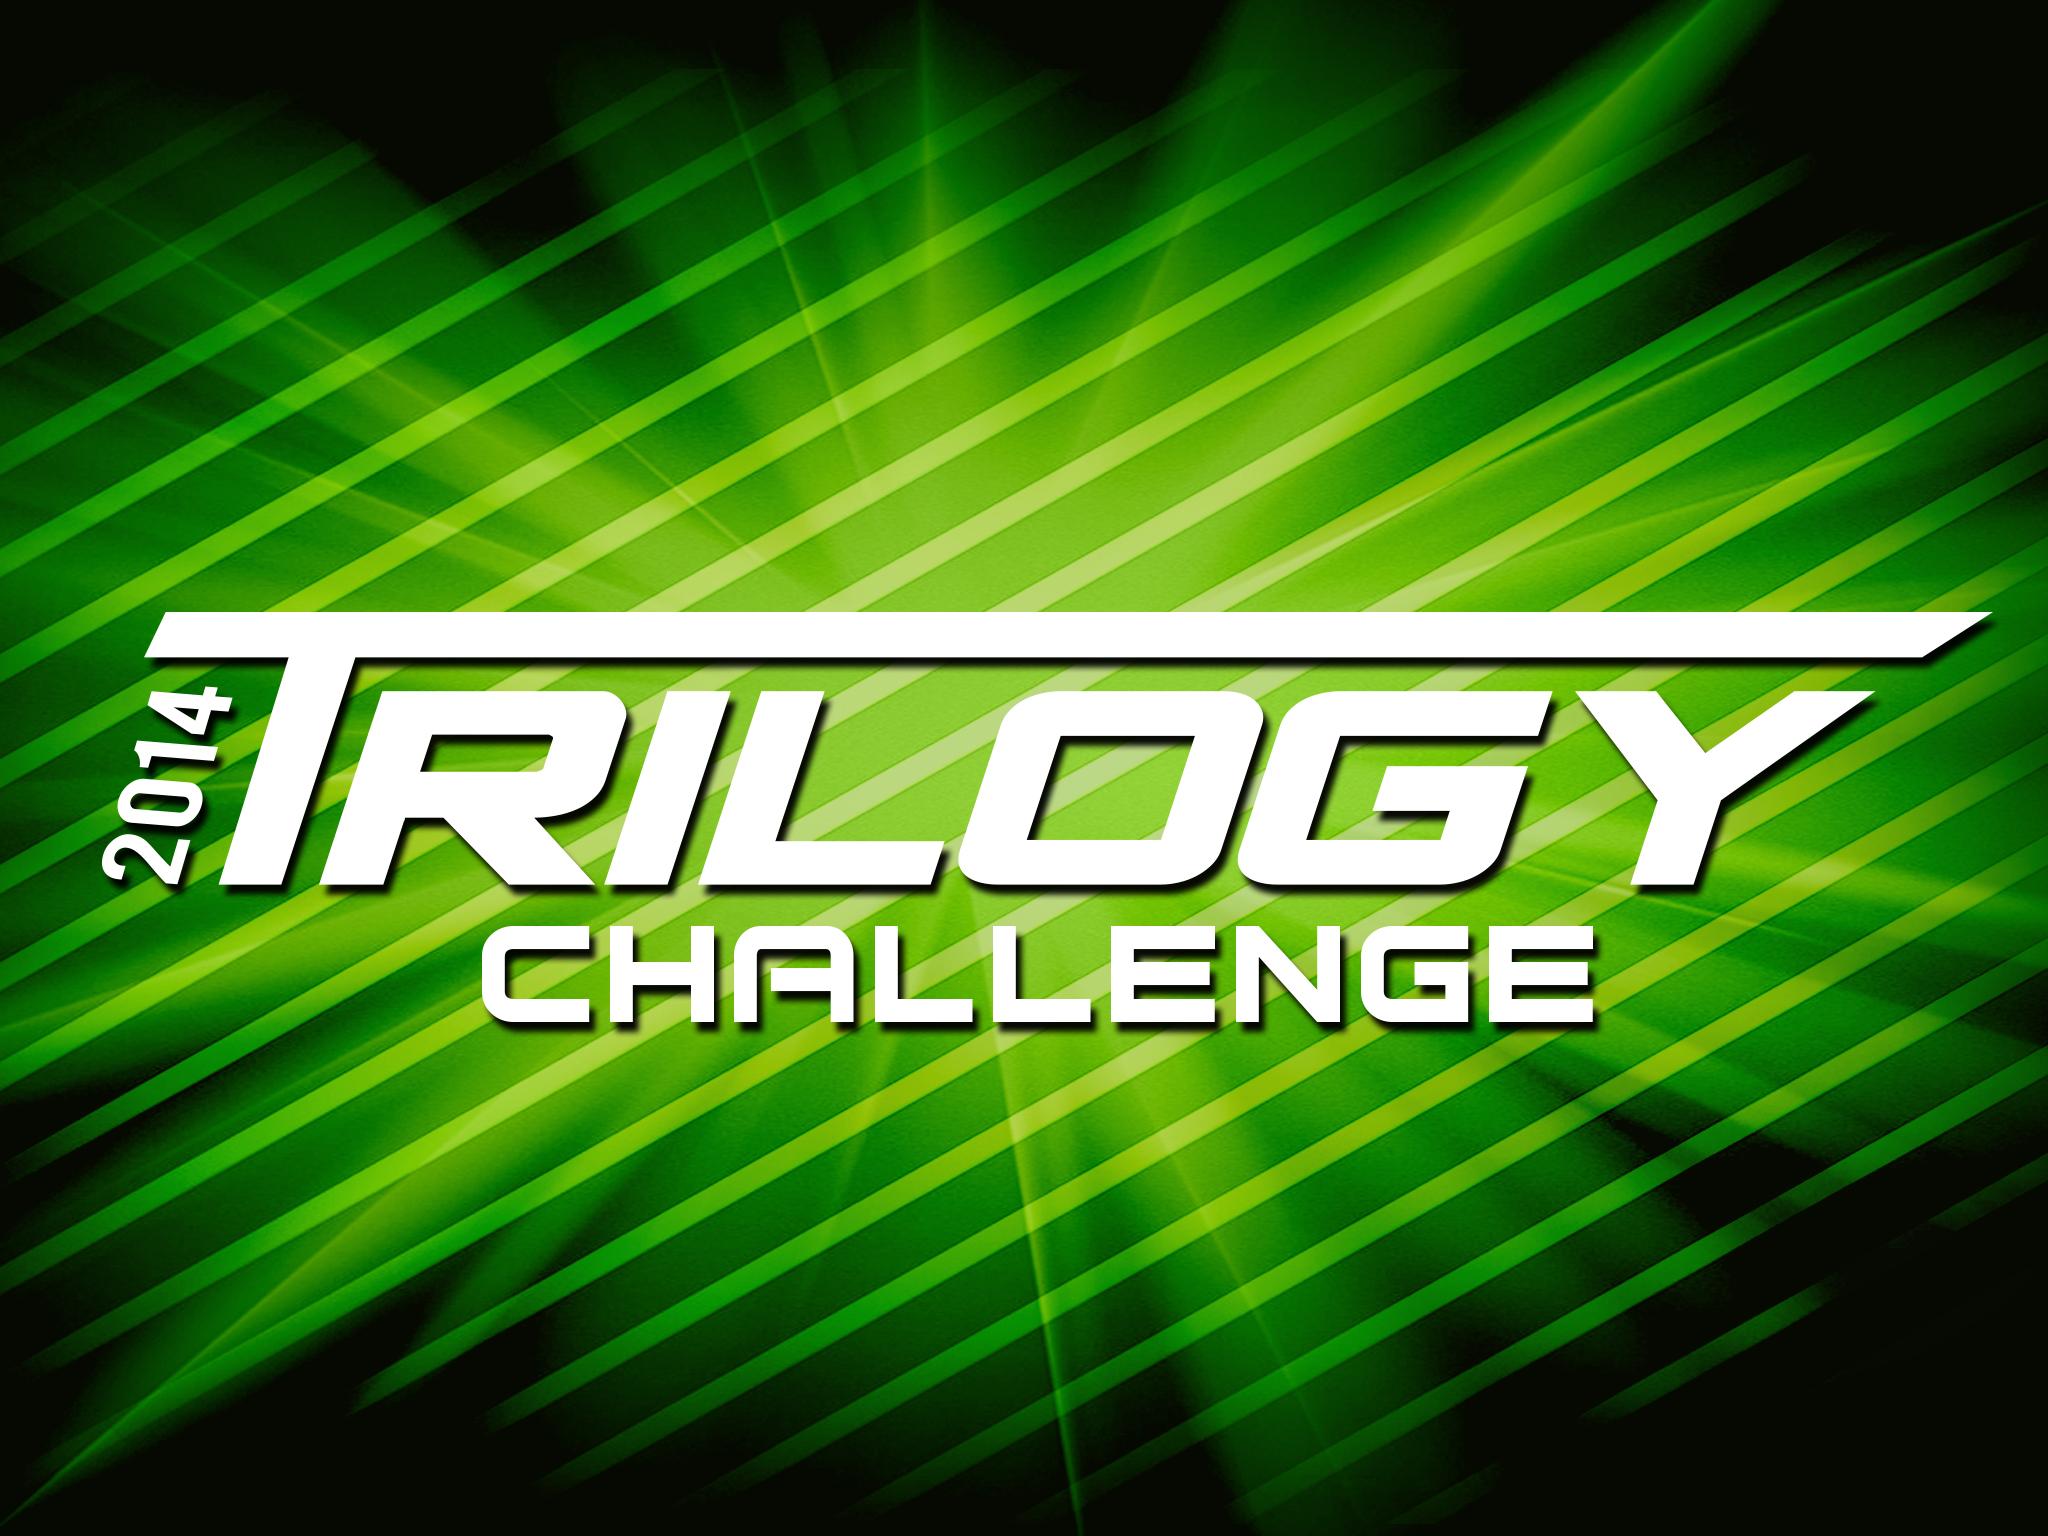 2014-Trilogy-Challenge-Background-iPad